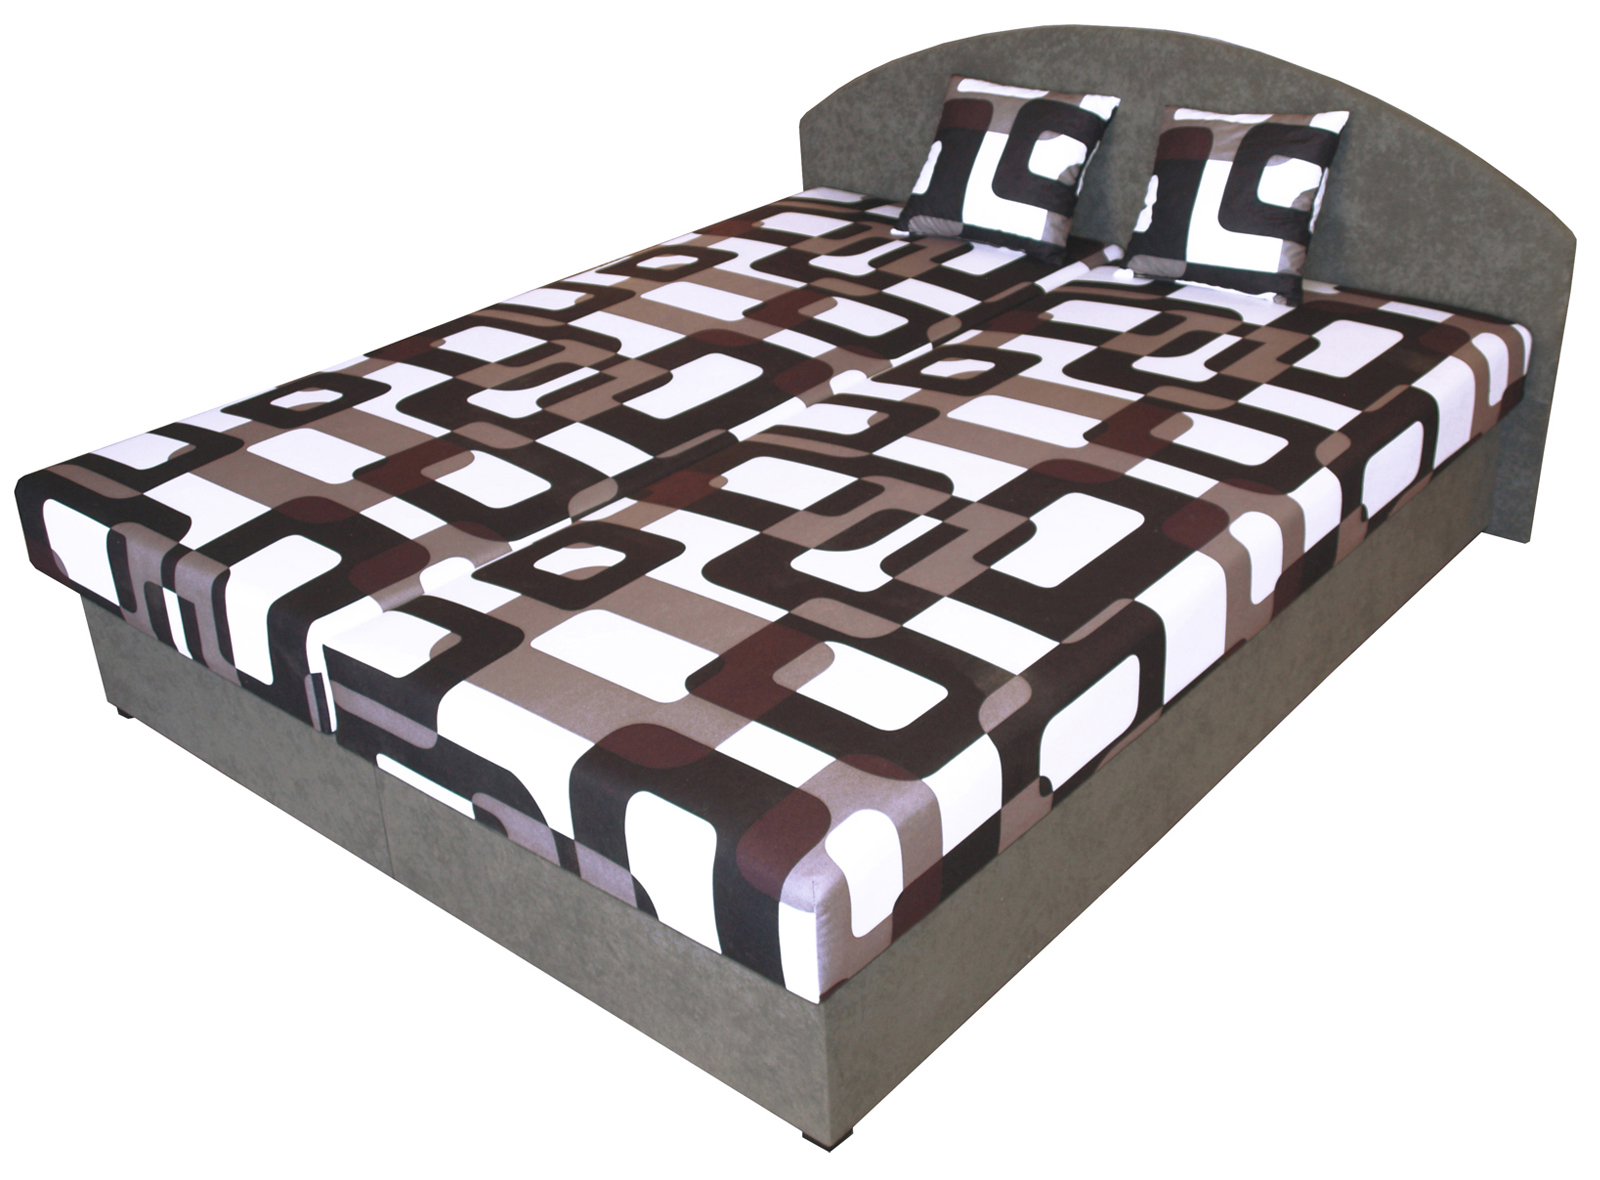 Manželská postel 160 cm - Benab - Sara (s rošty a matracemi)